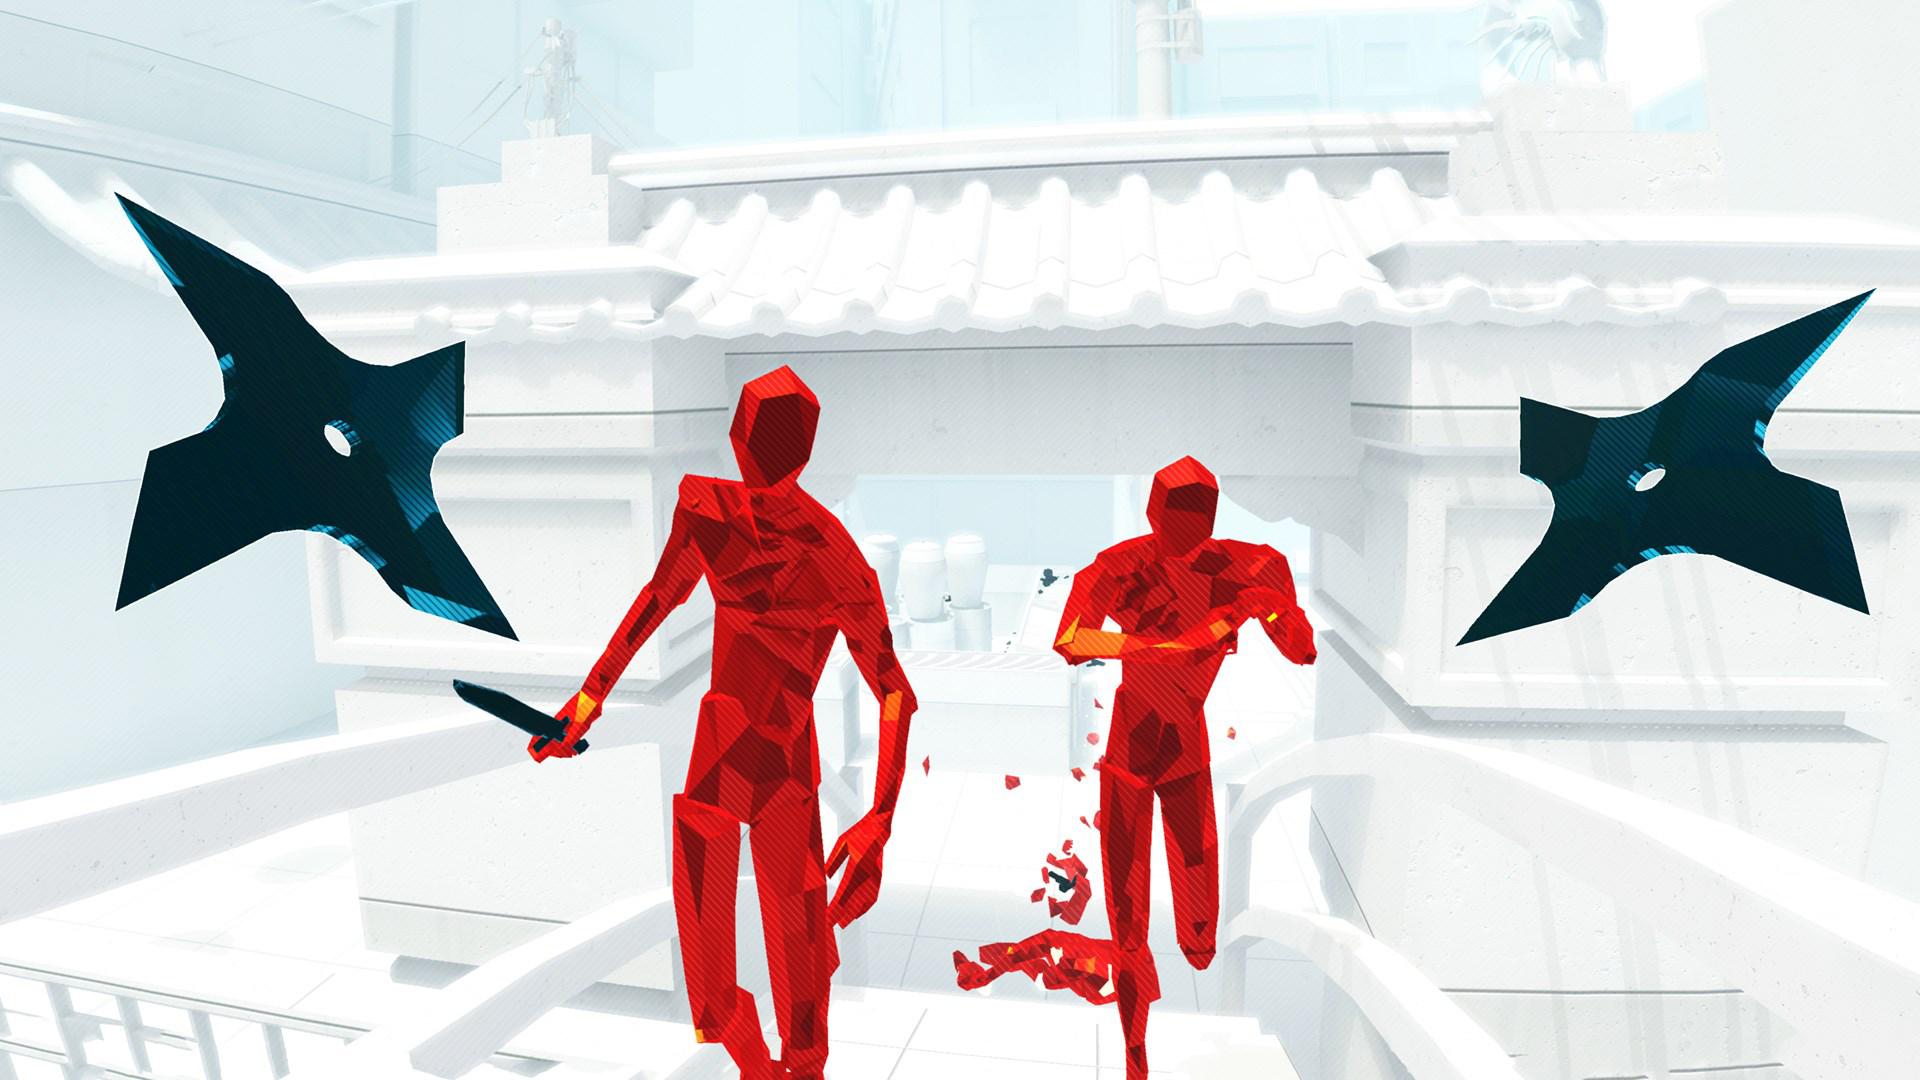 『SUPERHOT VR』ゲーム画面